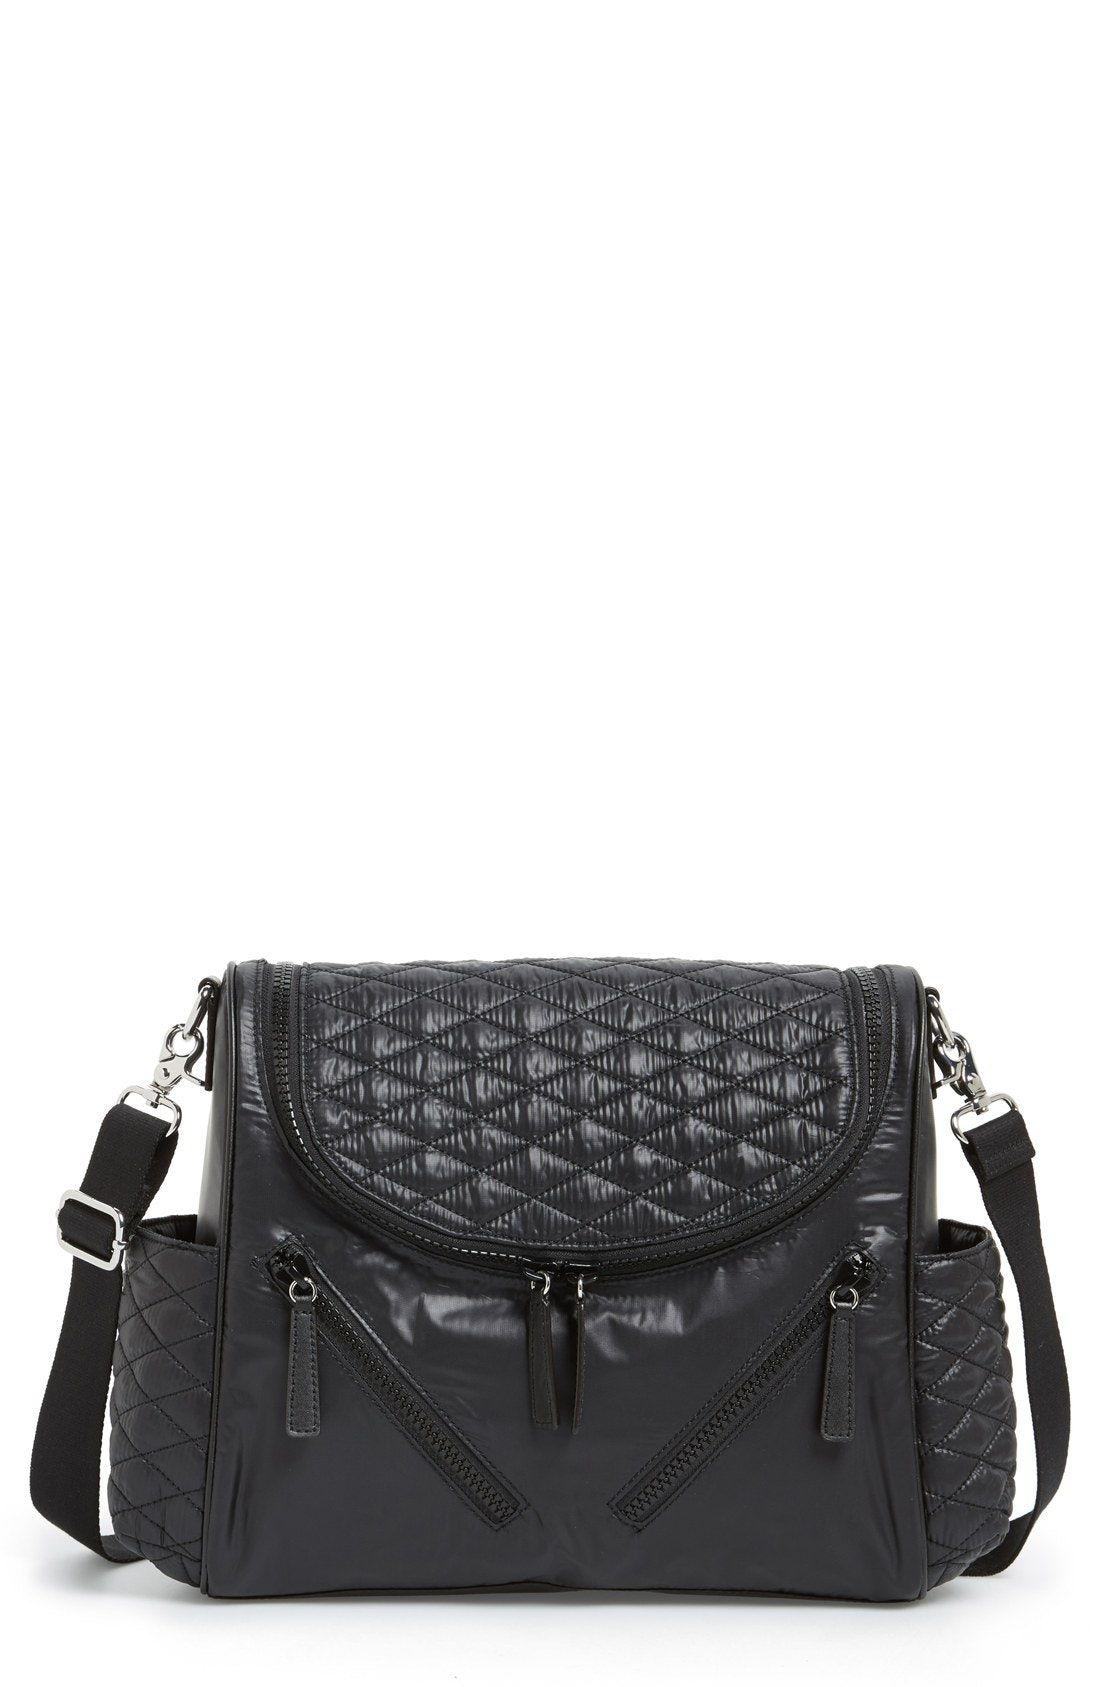 New Rebecca Minkoff Jude Nylon Baby Bag Fashion Online 295 Seehandbags